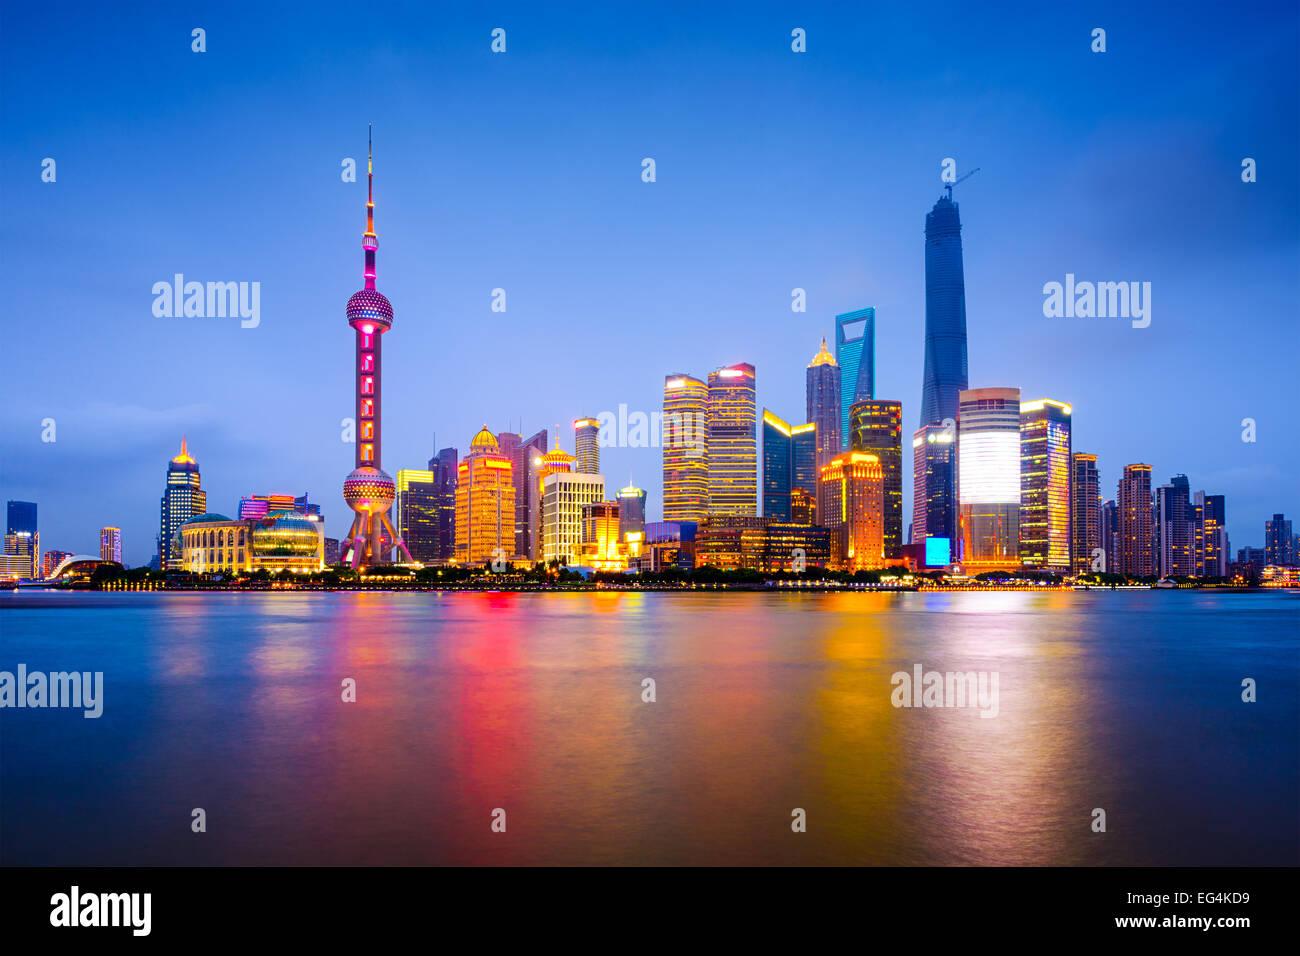 Shanghai, China city skyline on the Huangpu River. - Stock Image